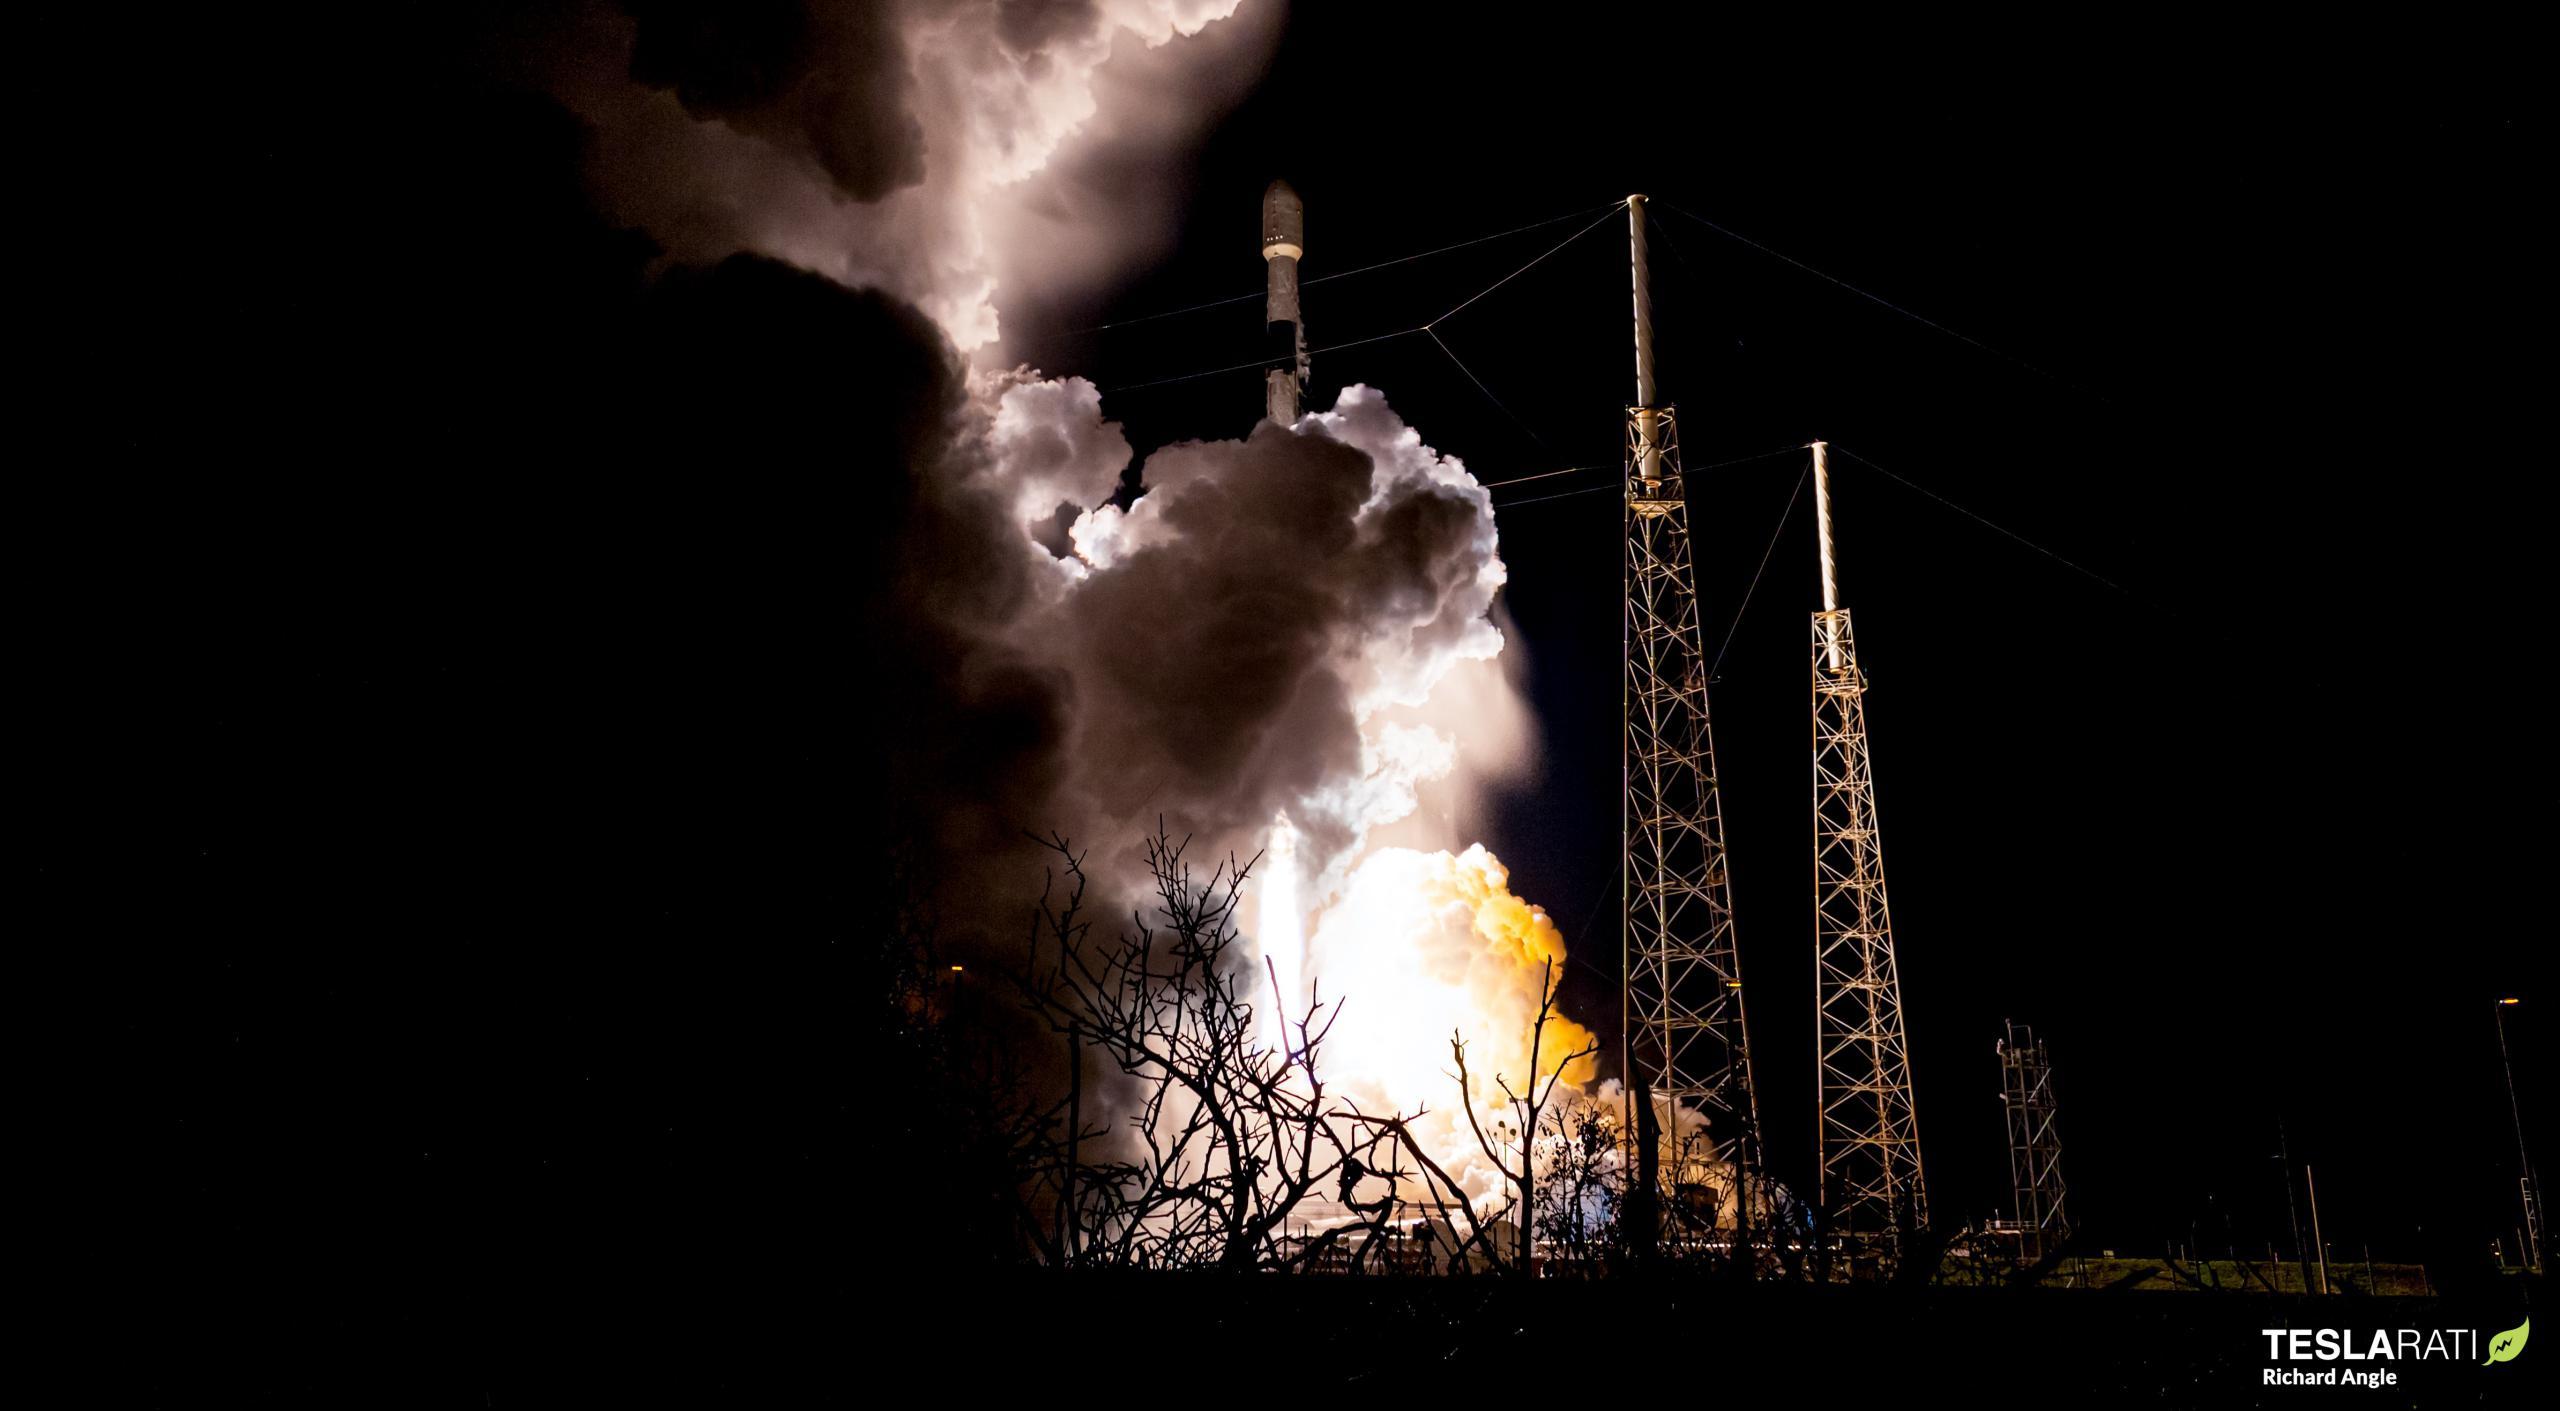 Starlink-27 Falcon 9 B1051 050921 (Richard Angle) launch 1 (c)